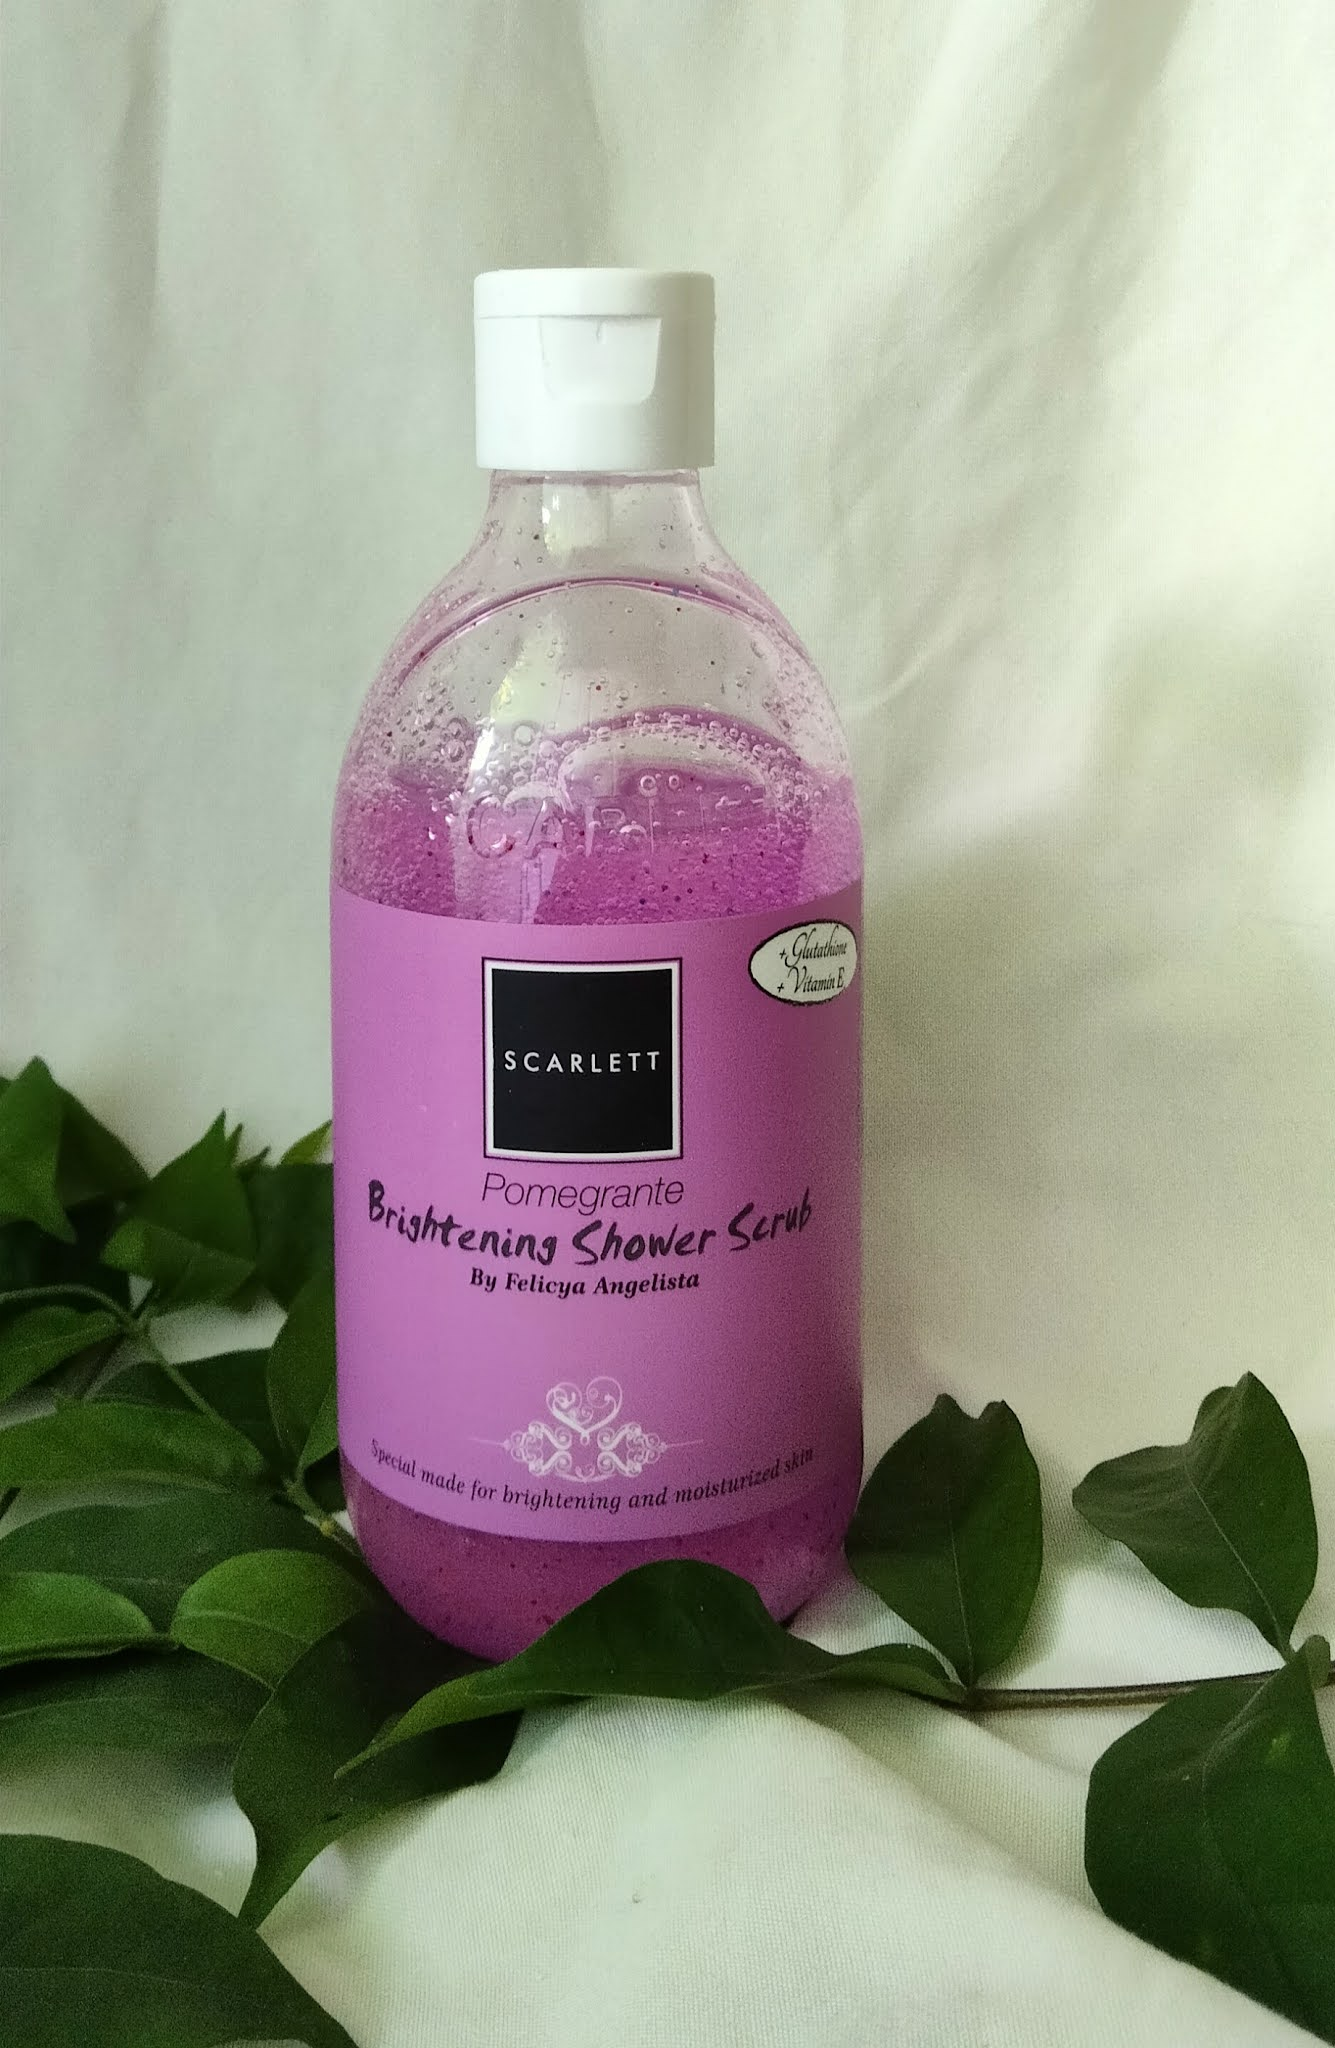 Shower Scrub Pomegrante